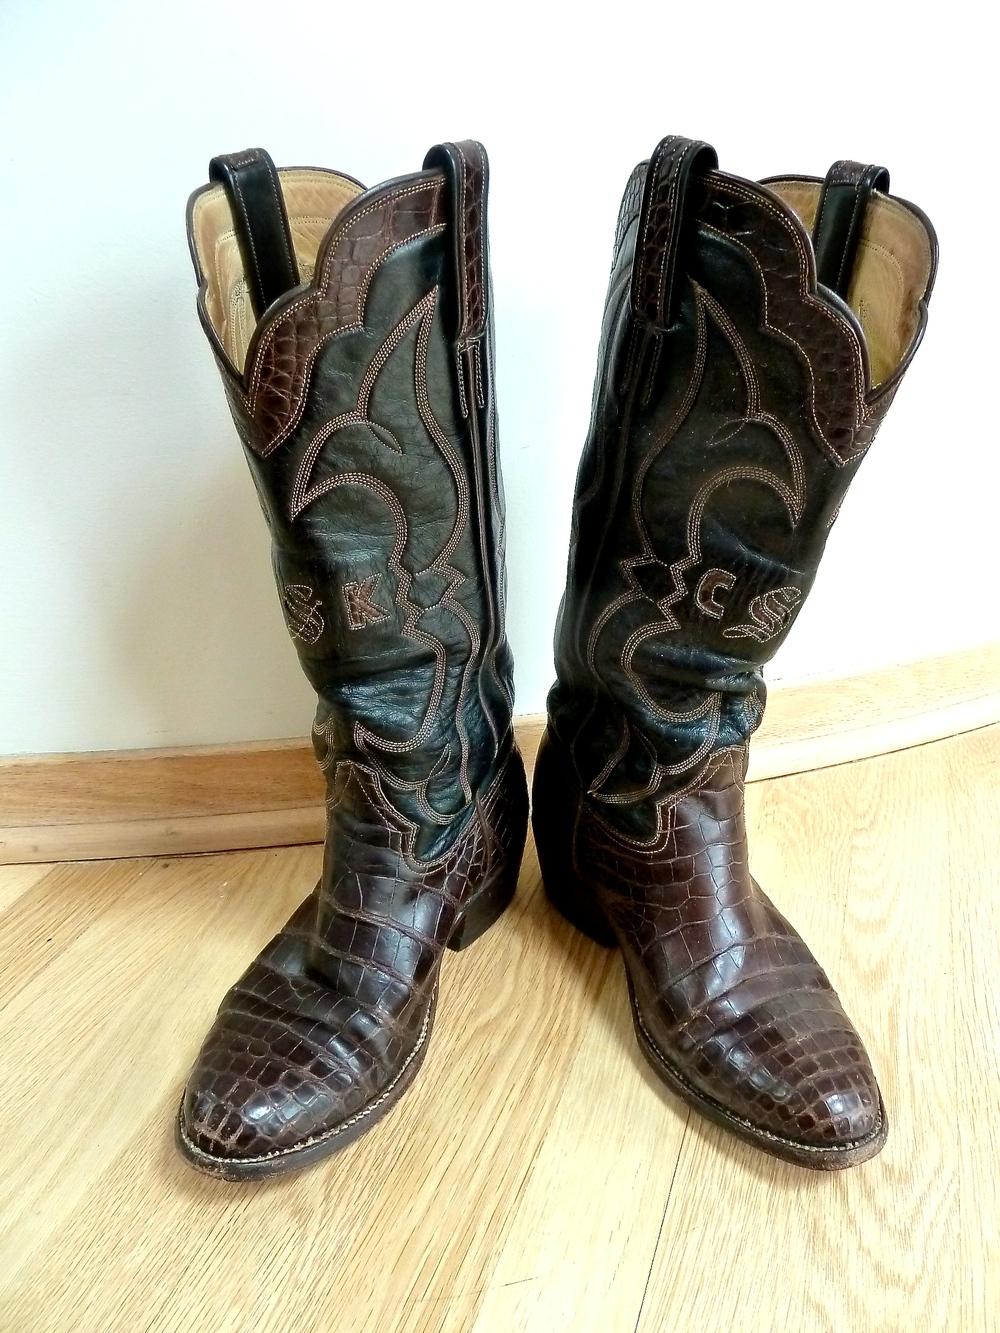 TST_boots2roots#1_Tania_photo.jpeg